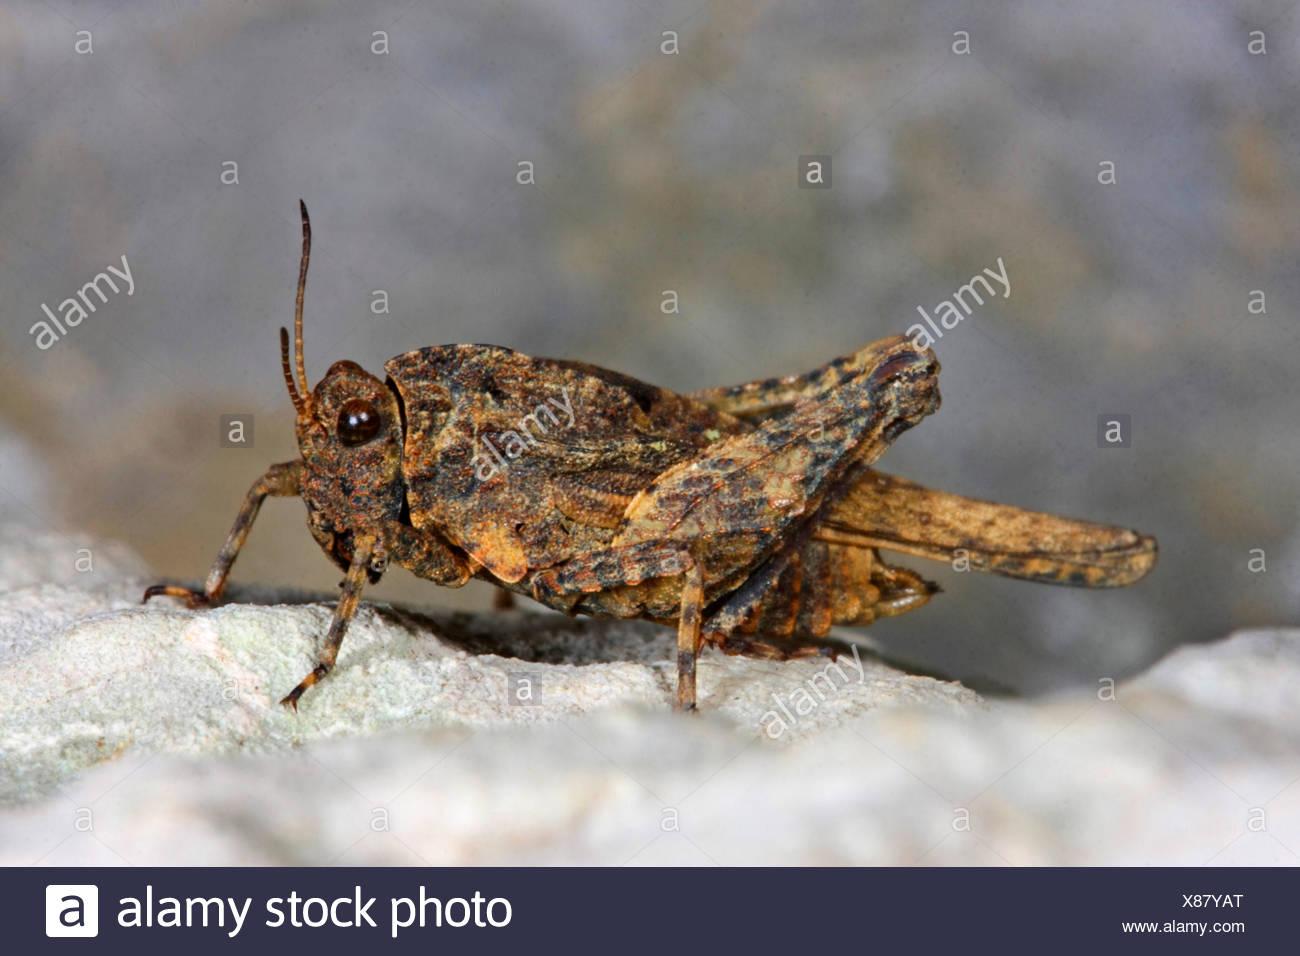 Depressed groundhopper, Flattened groundhopper (Uvarovitettix depressus, Depressotetrix depressa, Tettix depressus, Tettix depressa, Tetrix depressus, Tetrix depressa), sitting on a stone - Stock Image